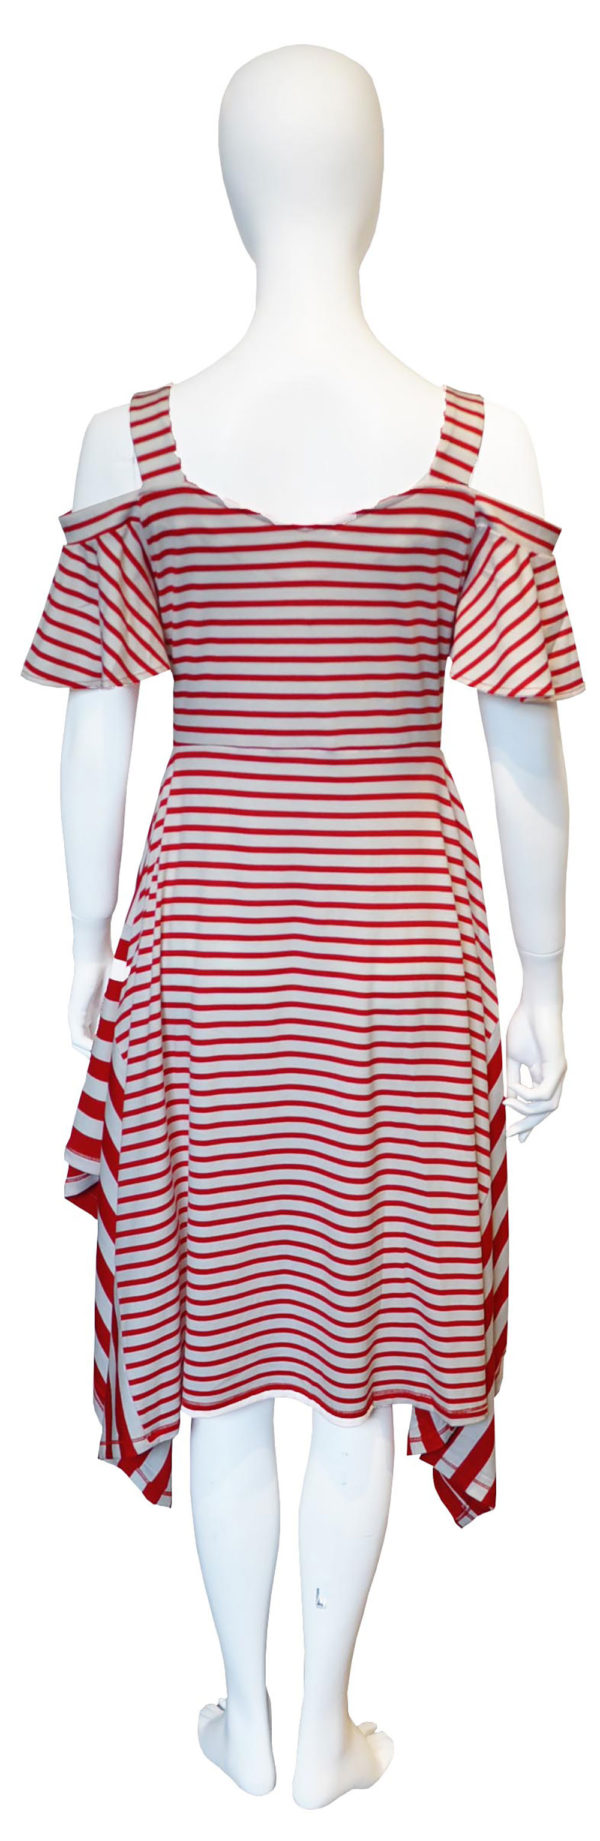 red striped dress- back